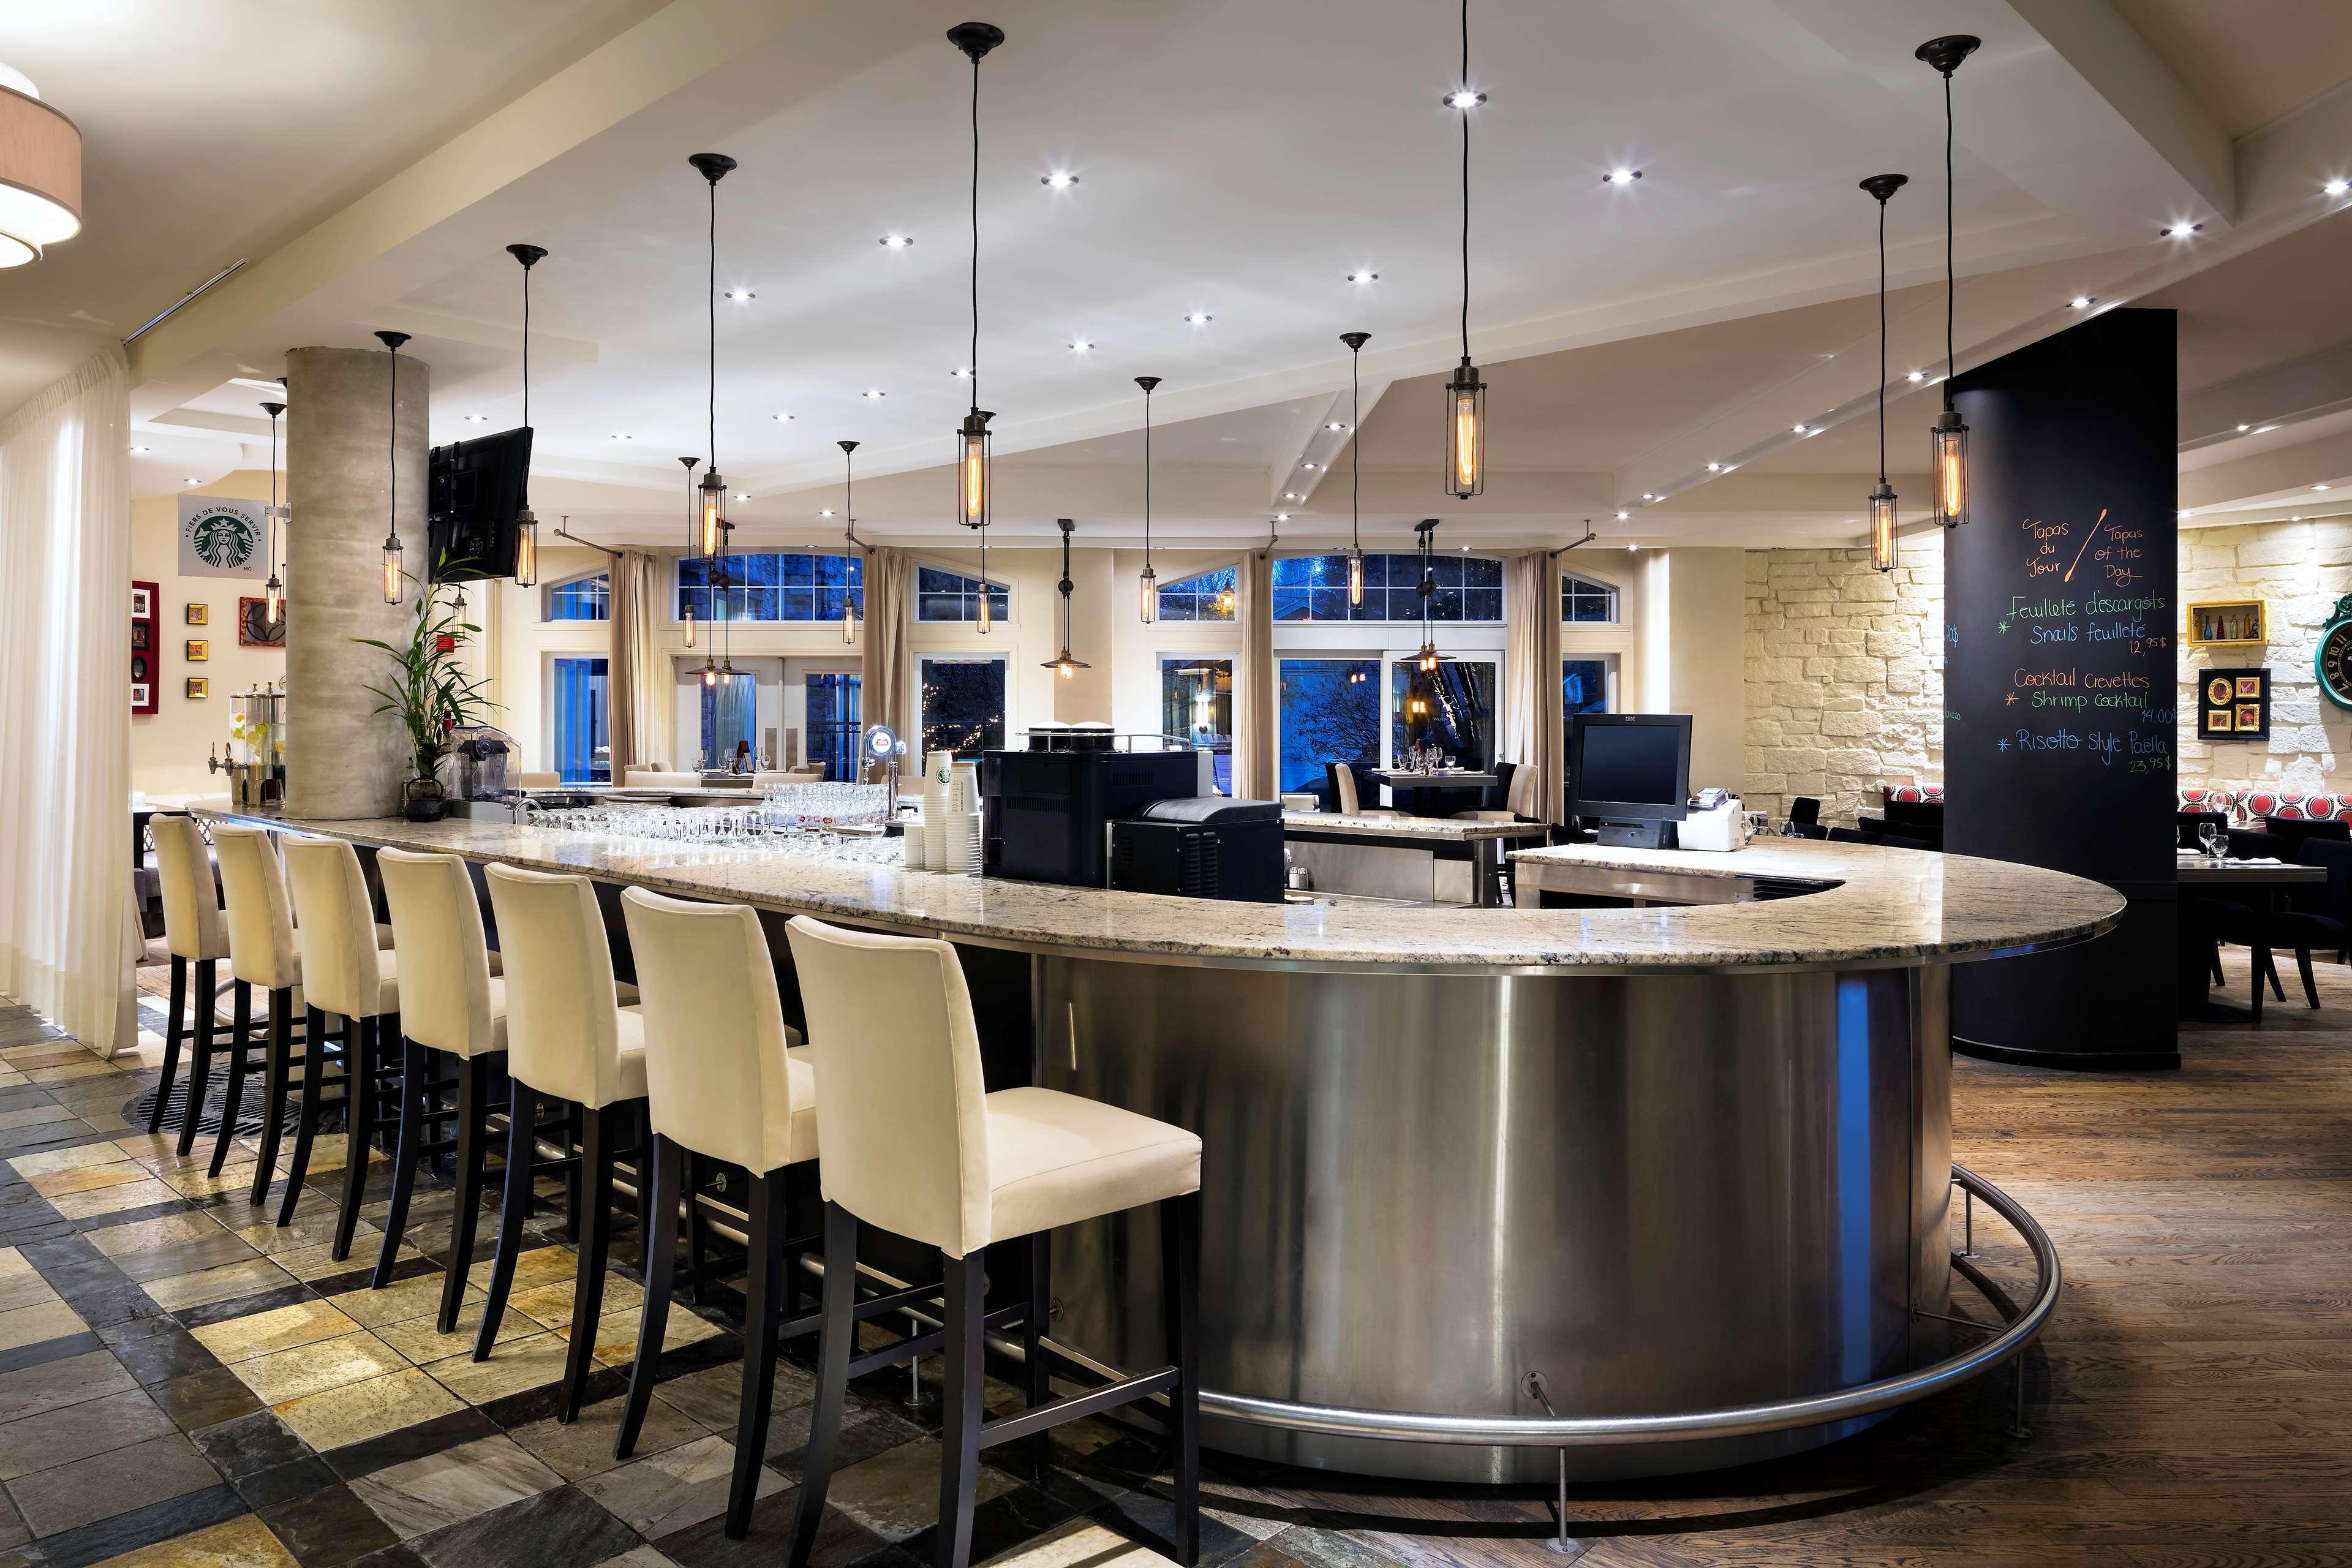 Le Westin Resort & Spa, Tremblant, Quebec à Mont Tremblant: Gypsy Bar & Restaurant